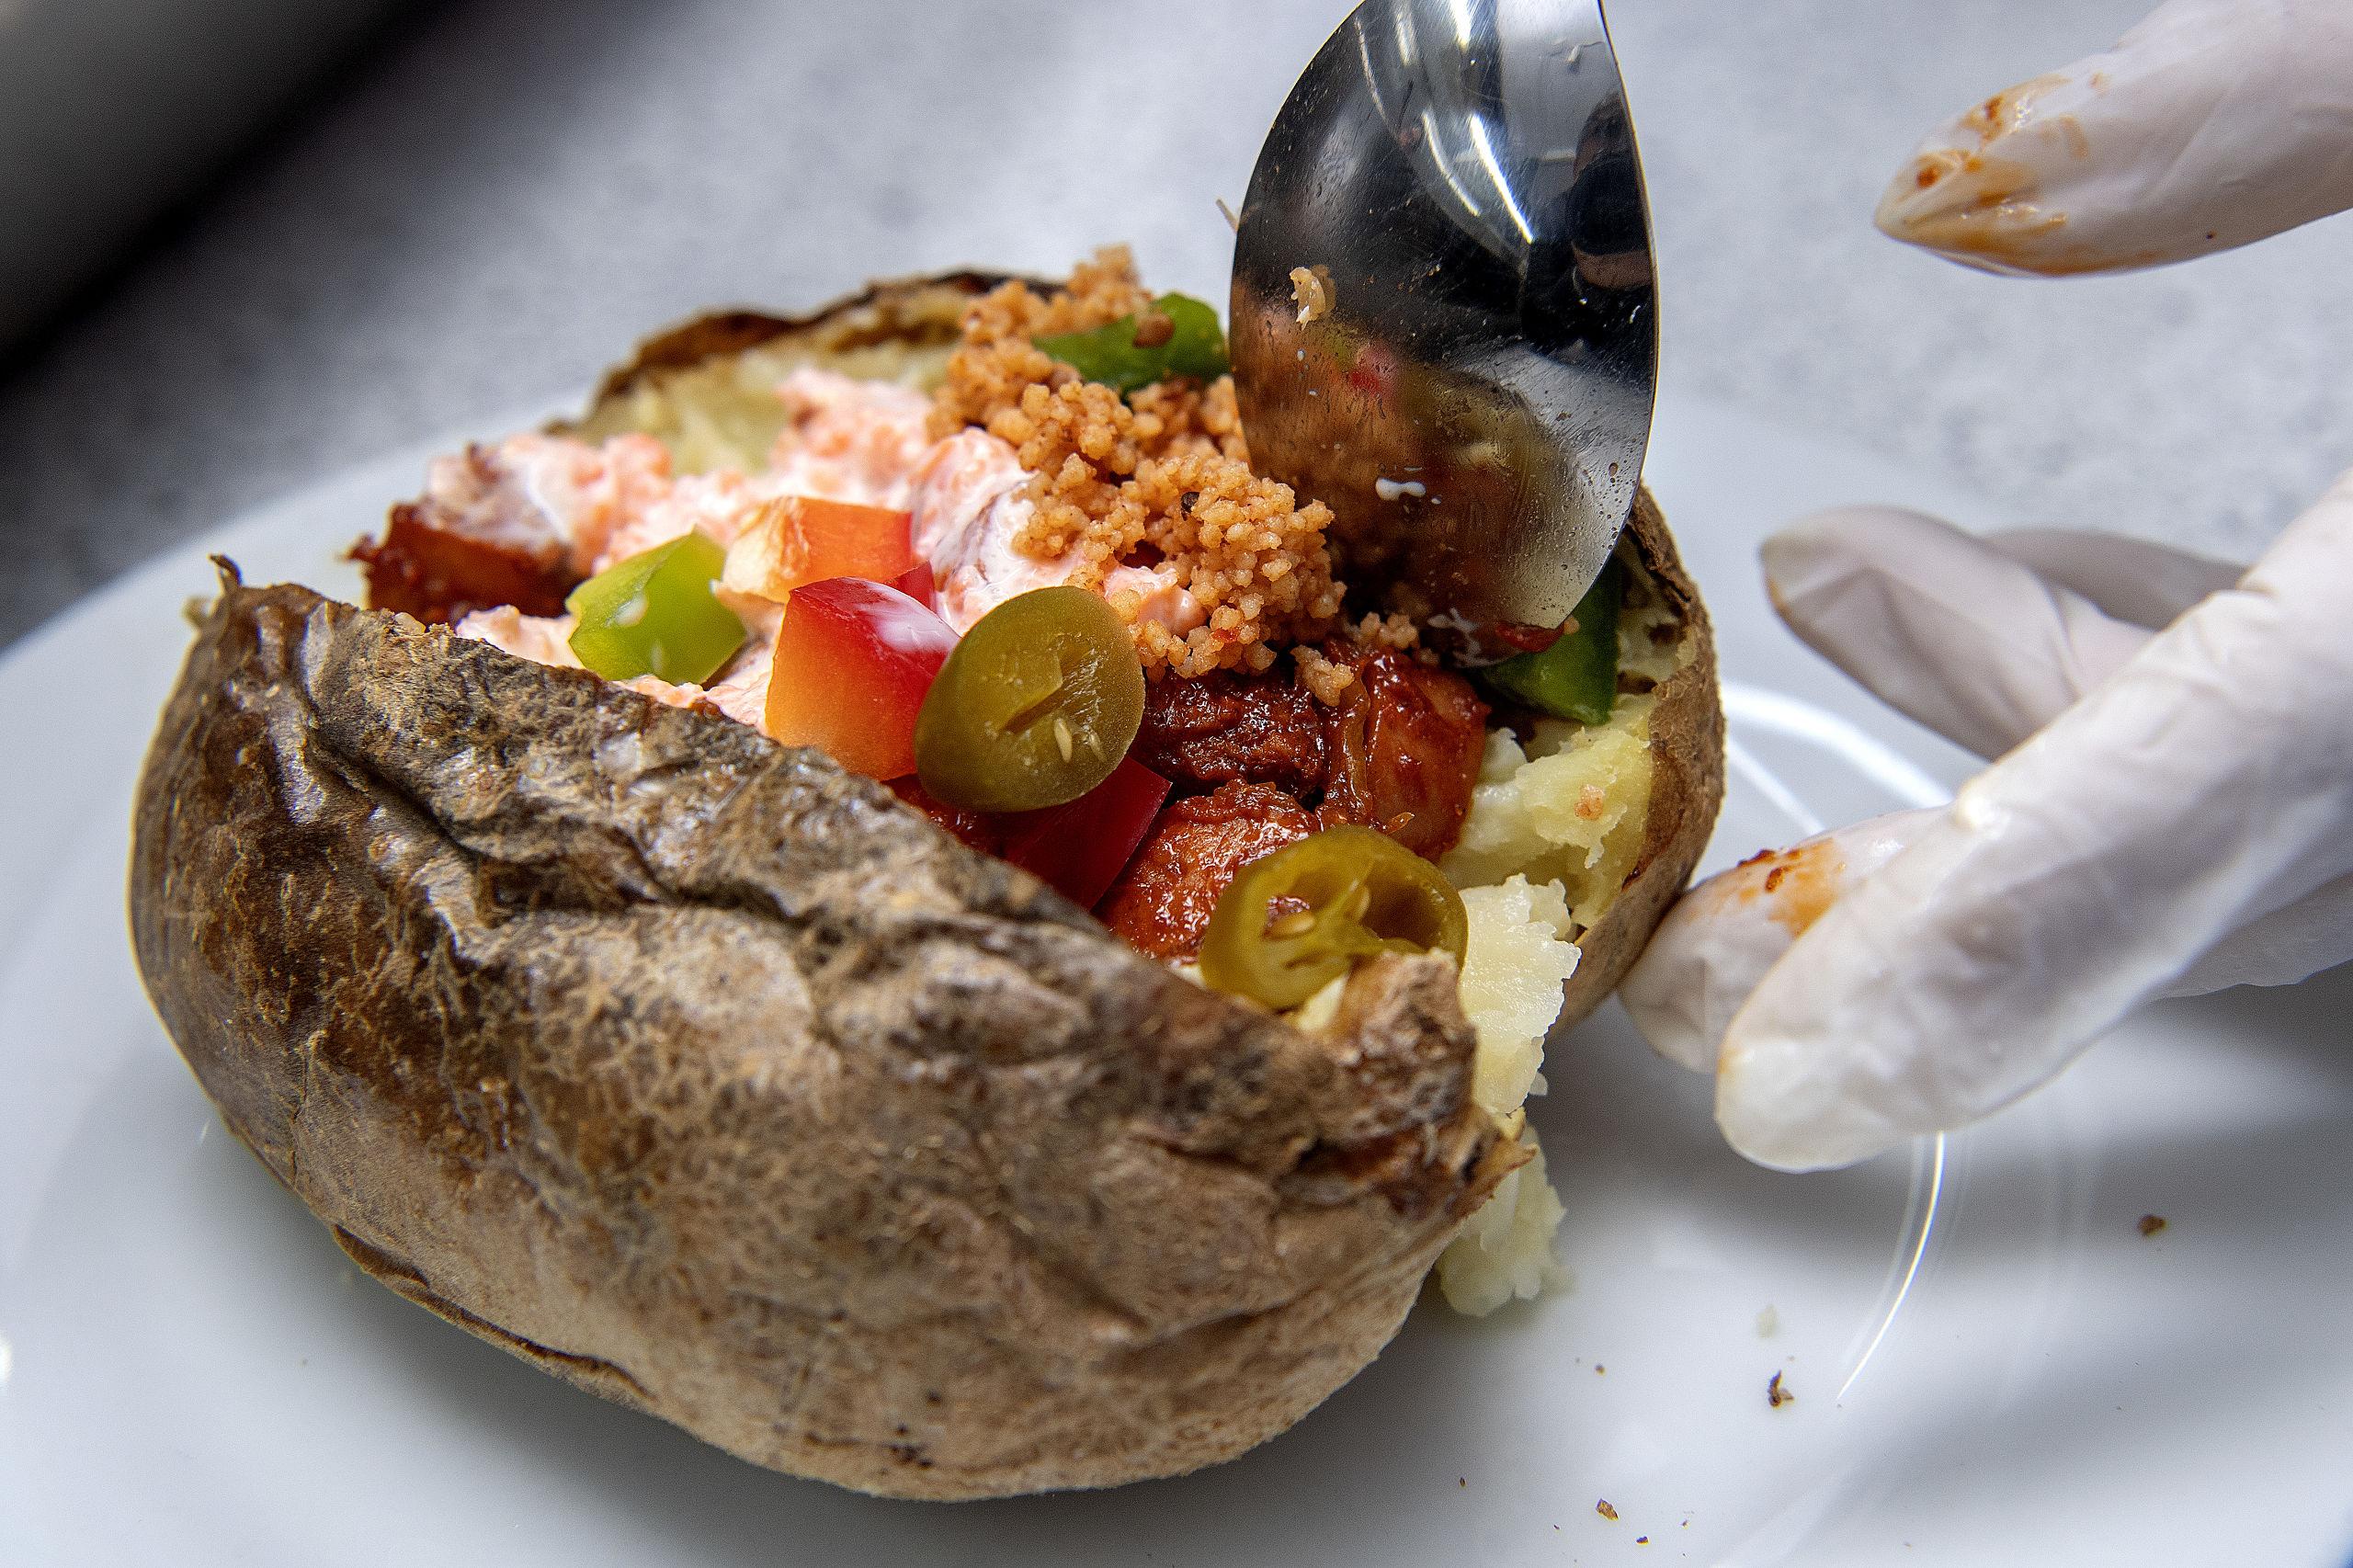 Nyt i Aalborg: Hotdog & Potato er netop åbnet